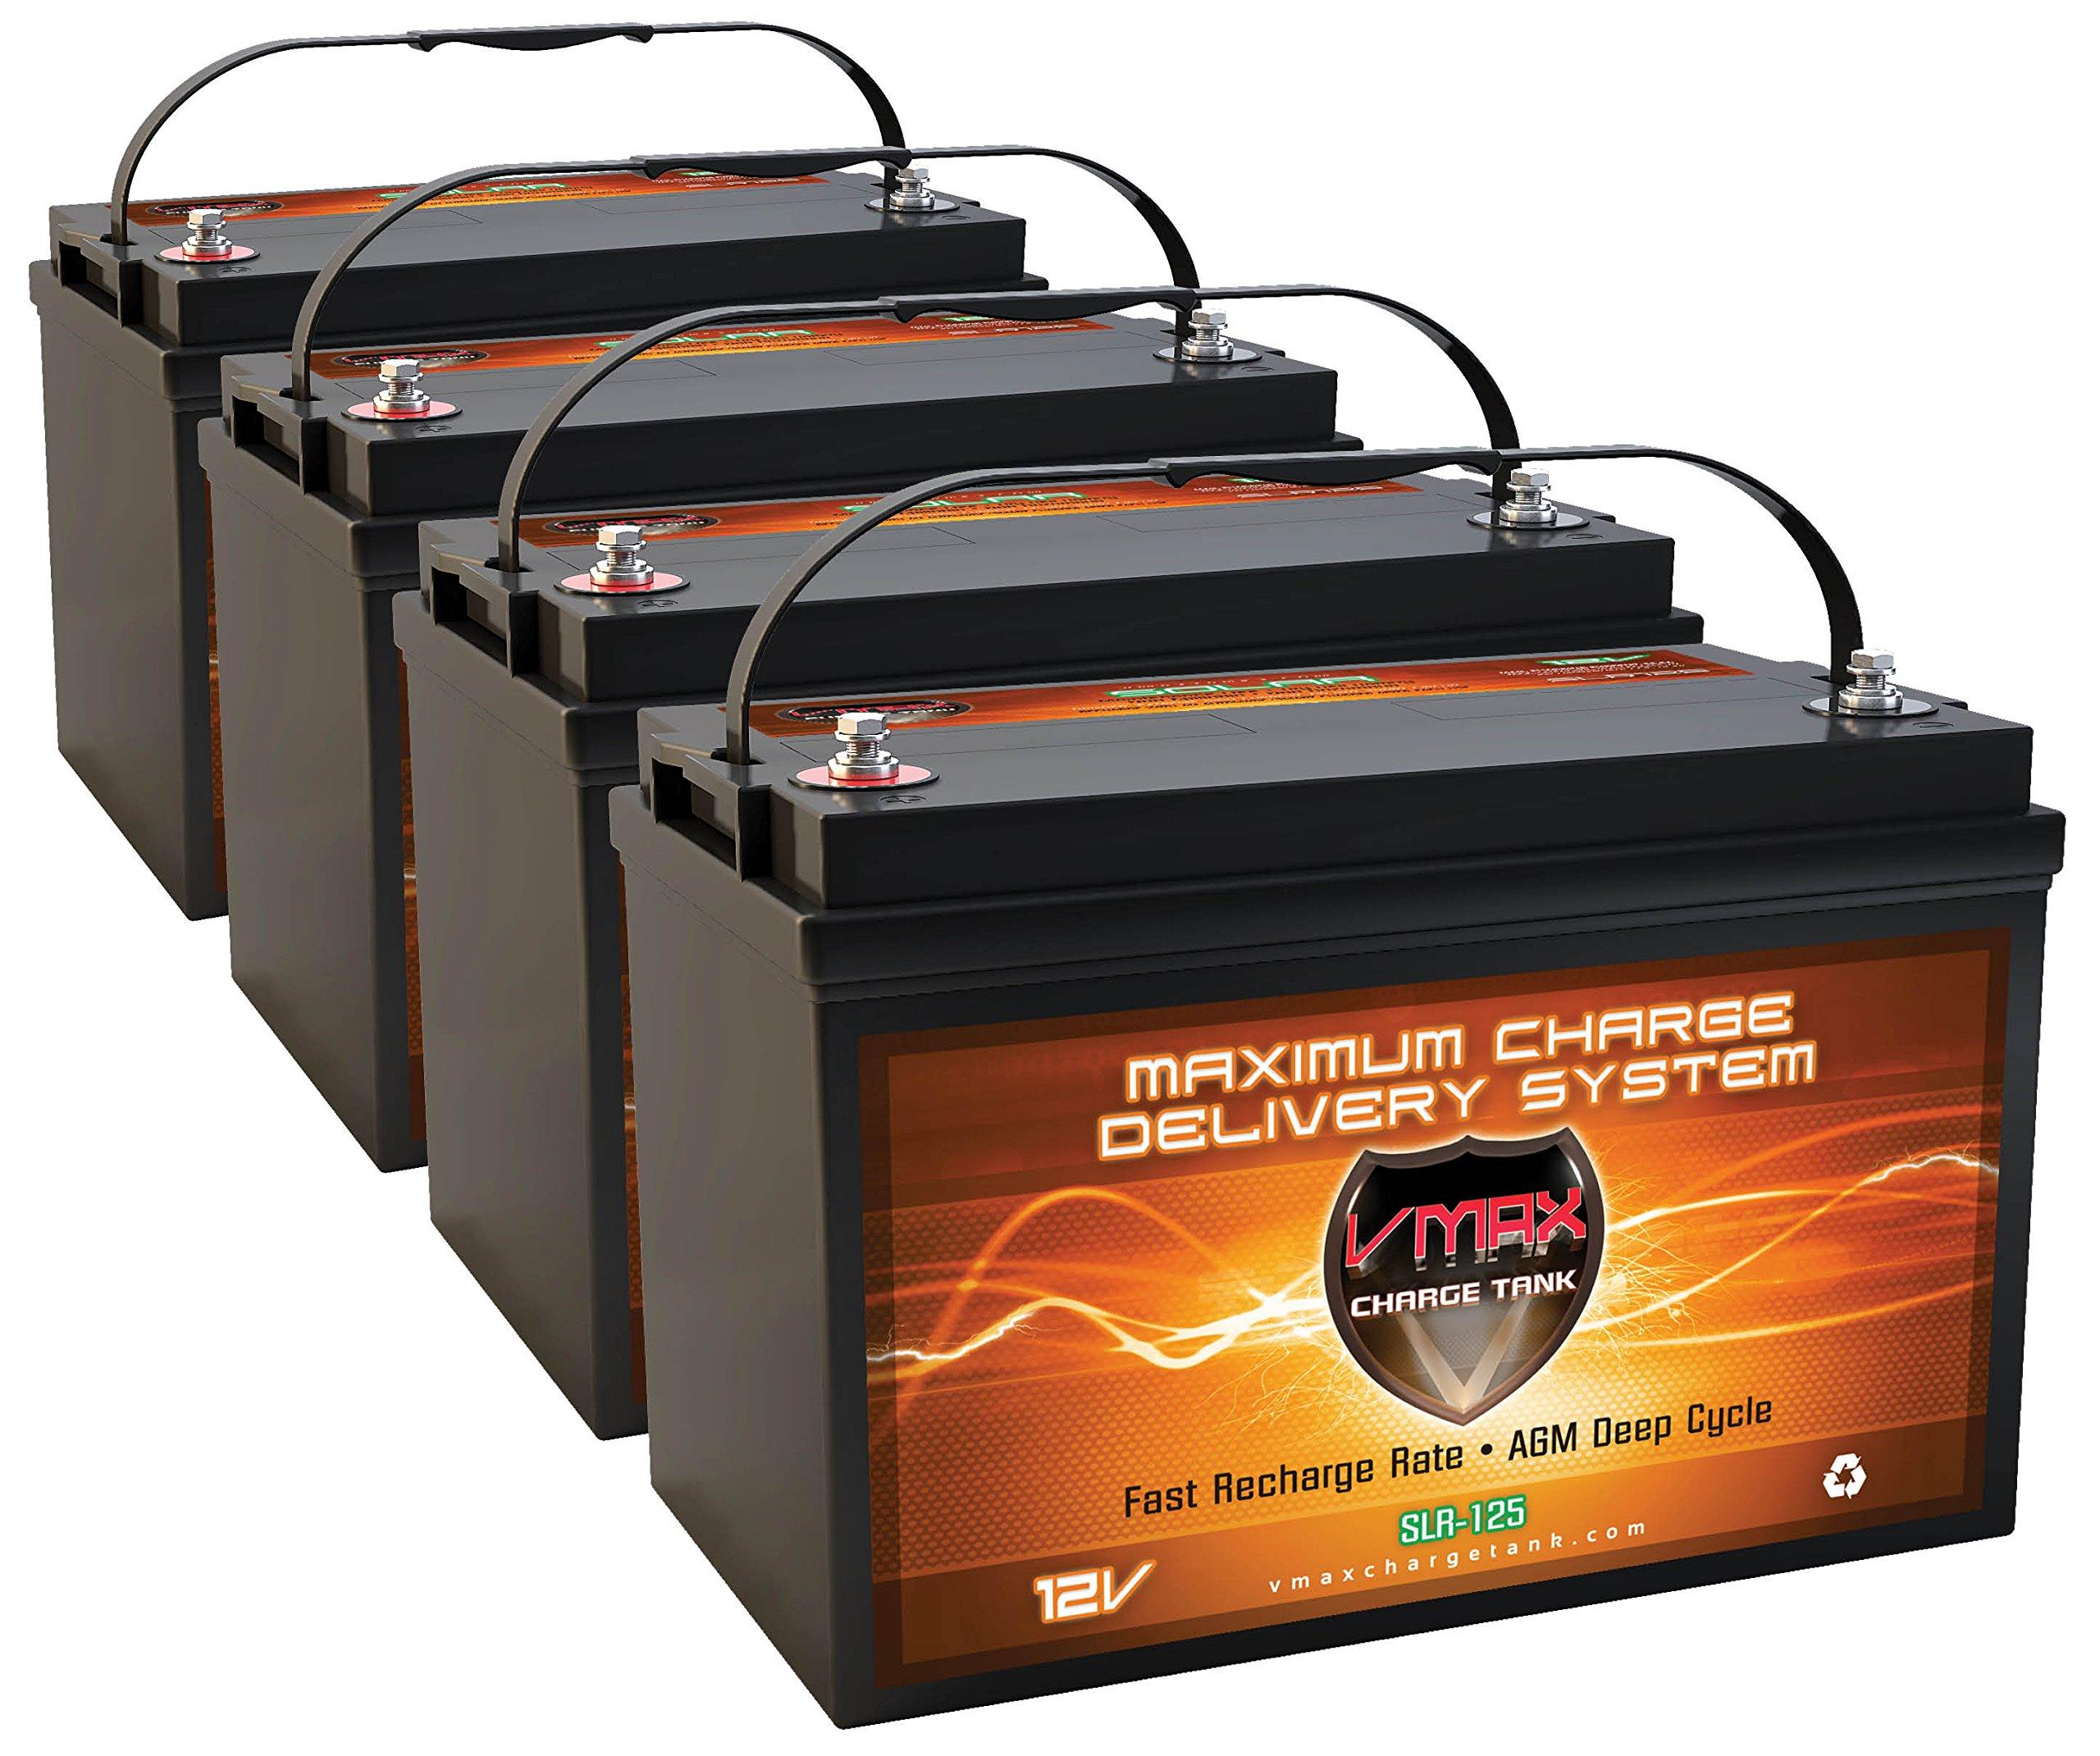 VMAX Solar VMAXSLR125-4 AGM Solar Battery (4 x SLR125 VMAX Batteries) by VMAX Solar